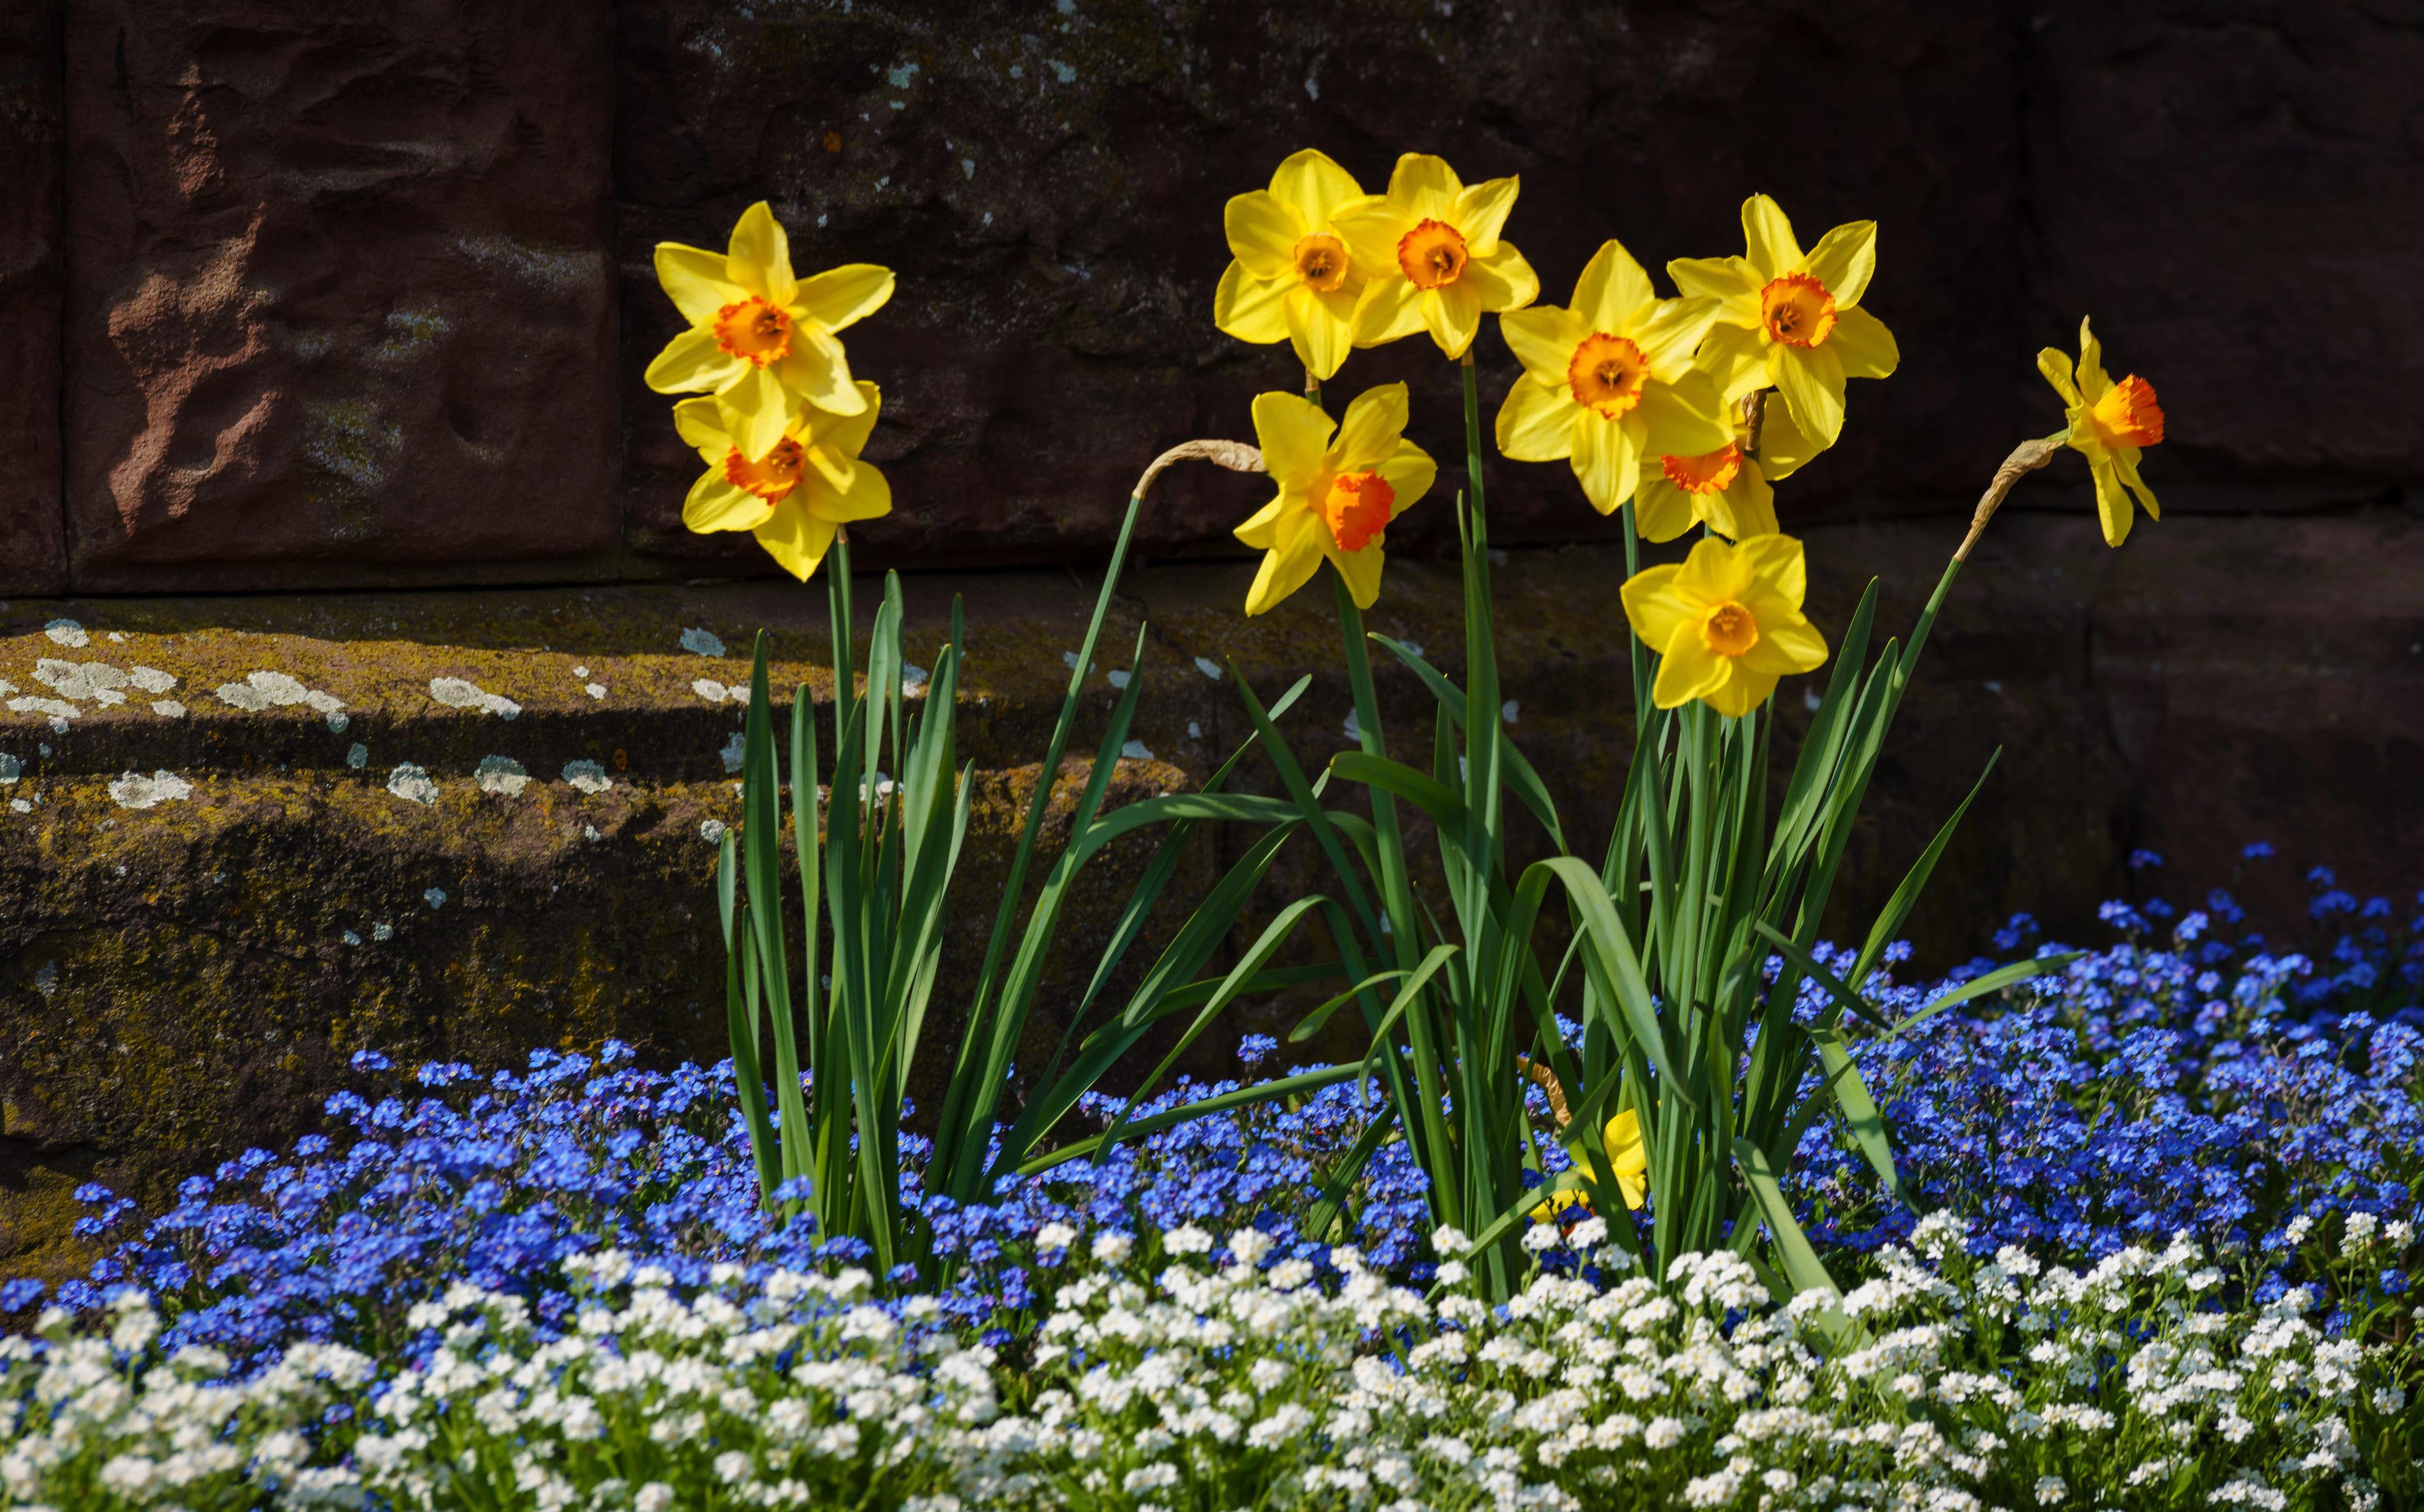 daffodils-photo-79